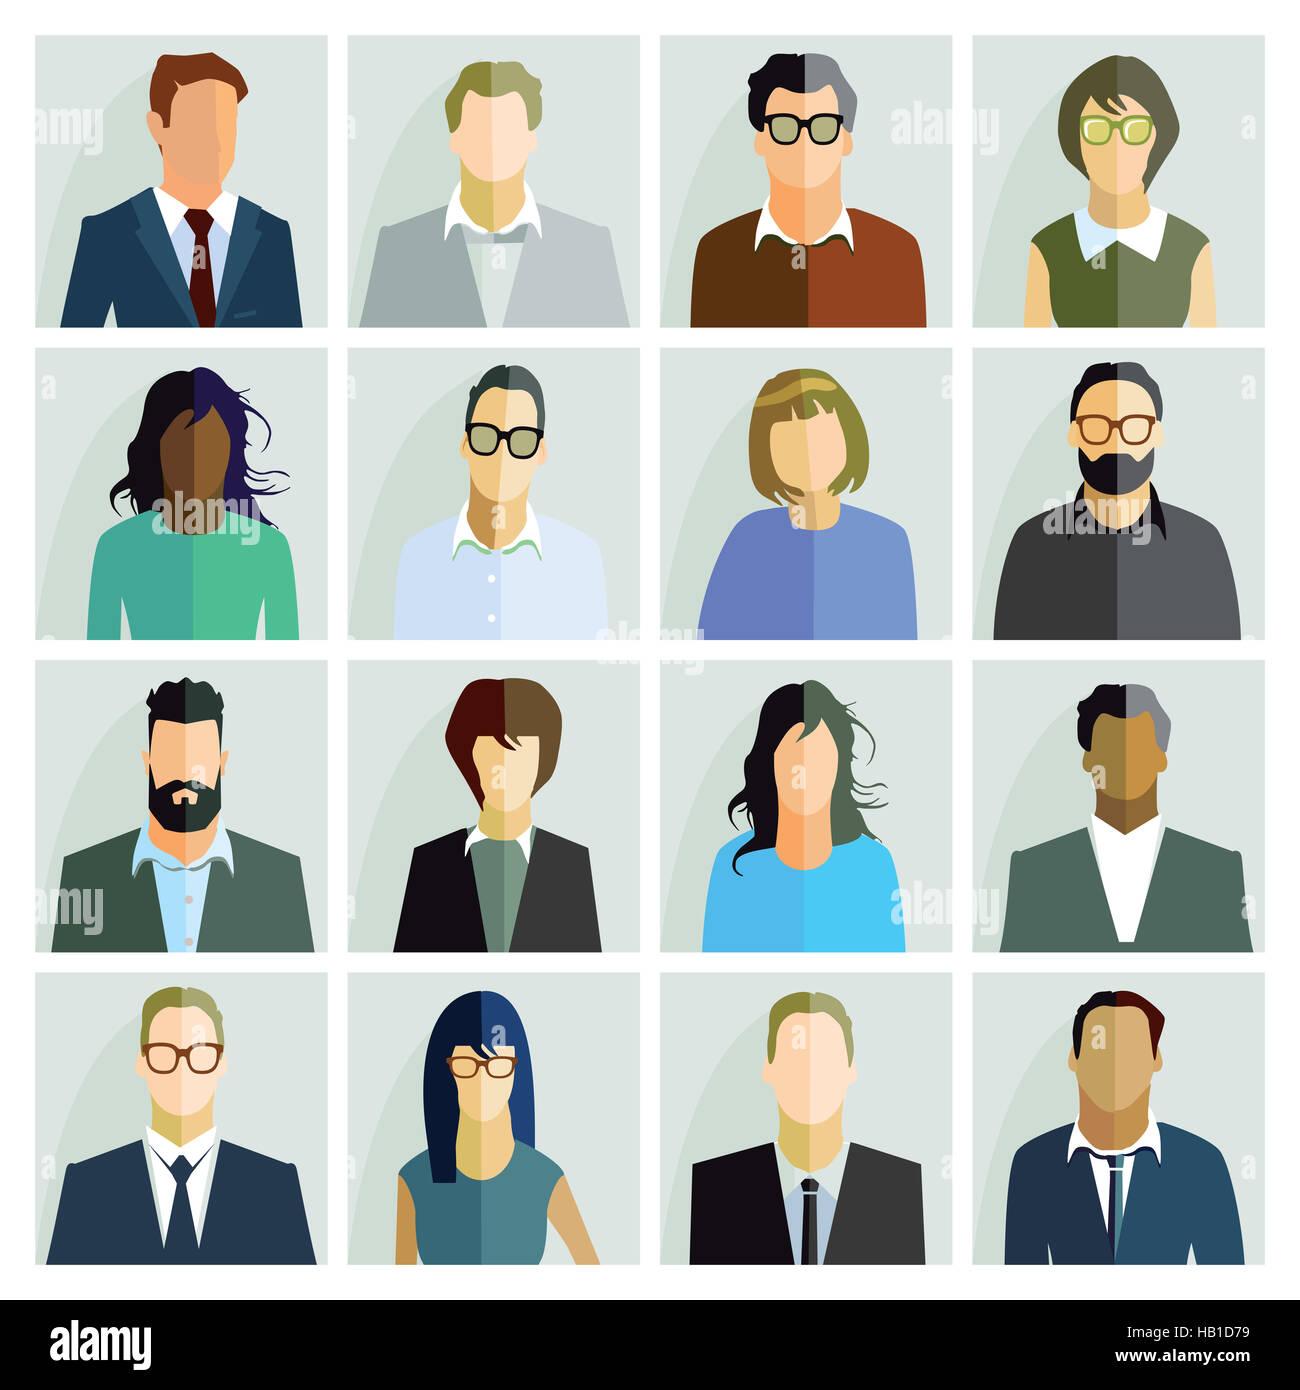 People Portrait - Stock Image